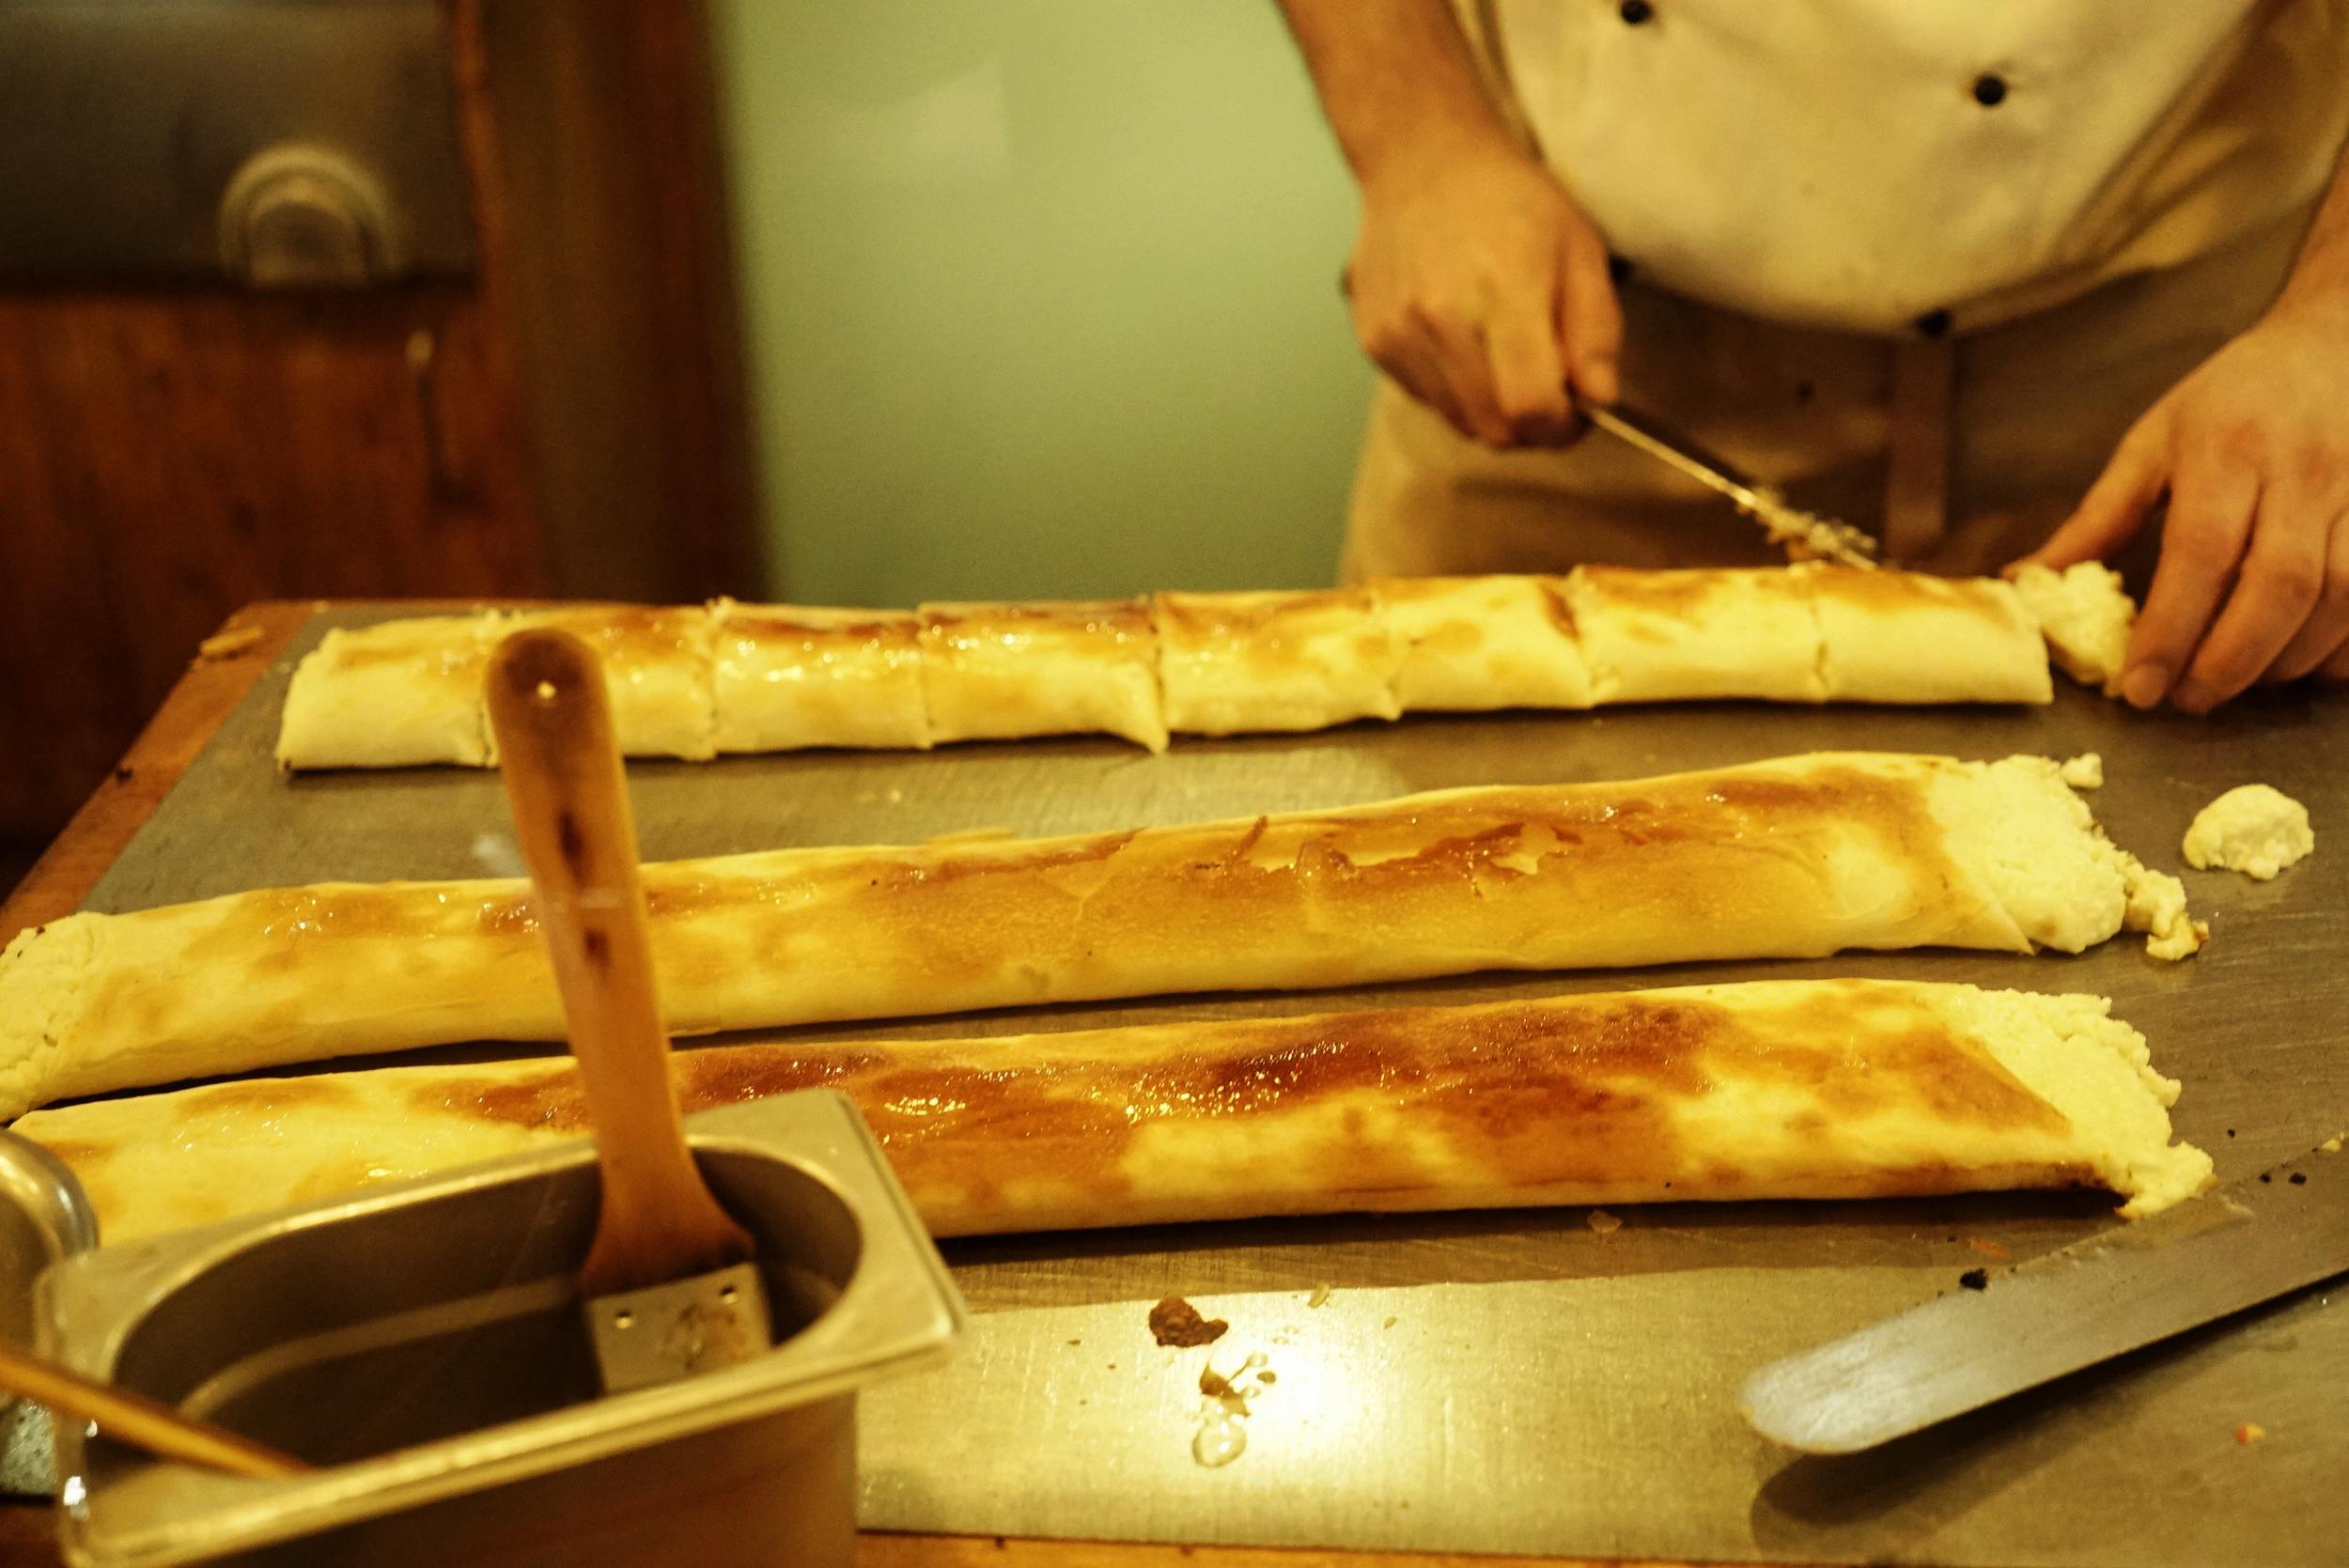 Making strudel in Budapest